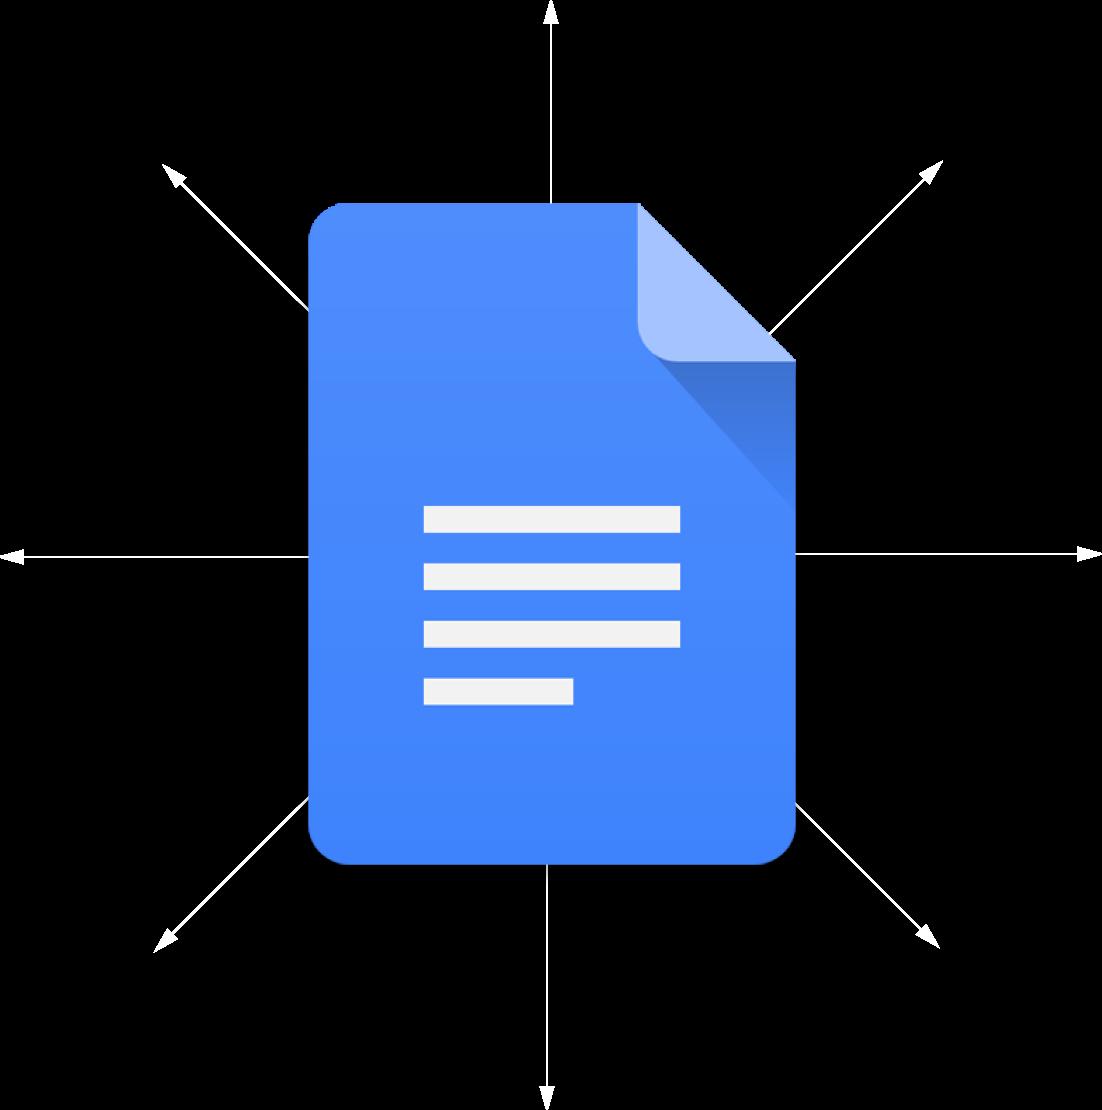 GoogleDoc Illustration